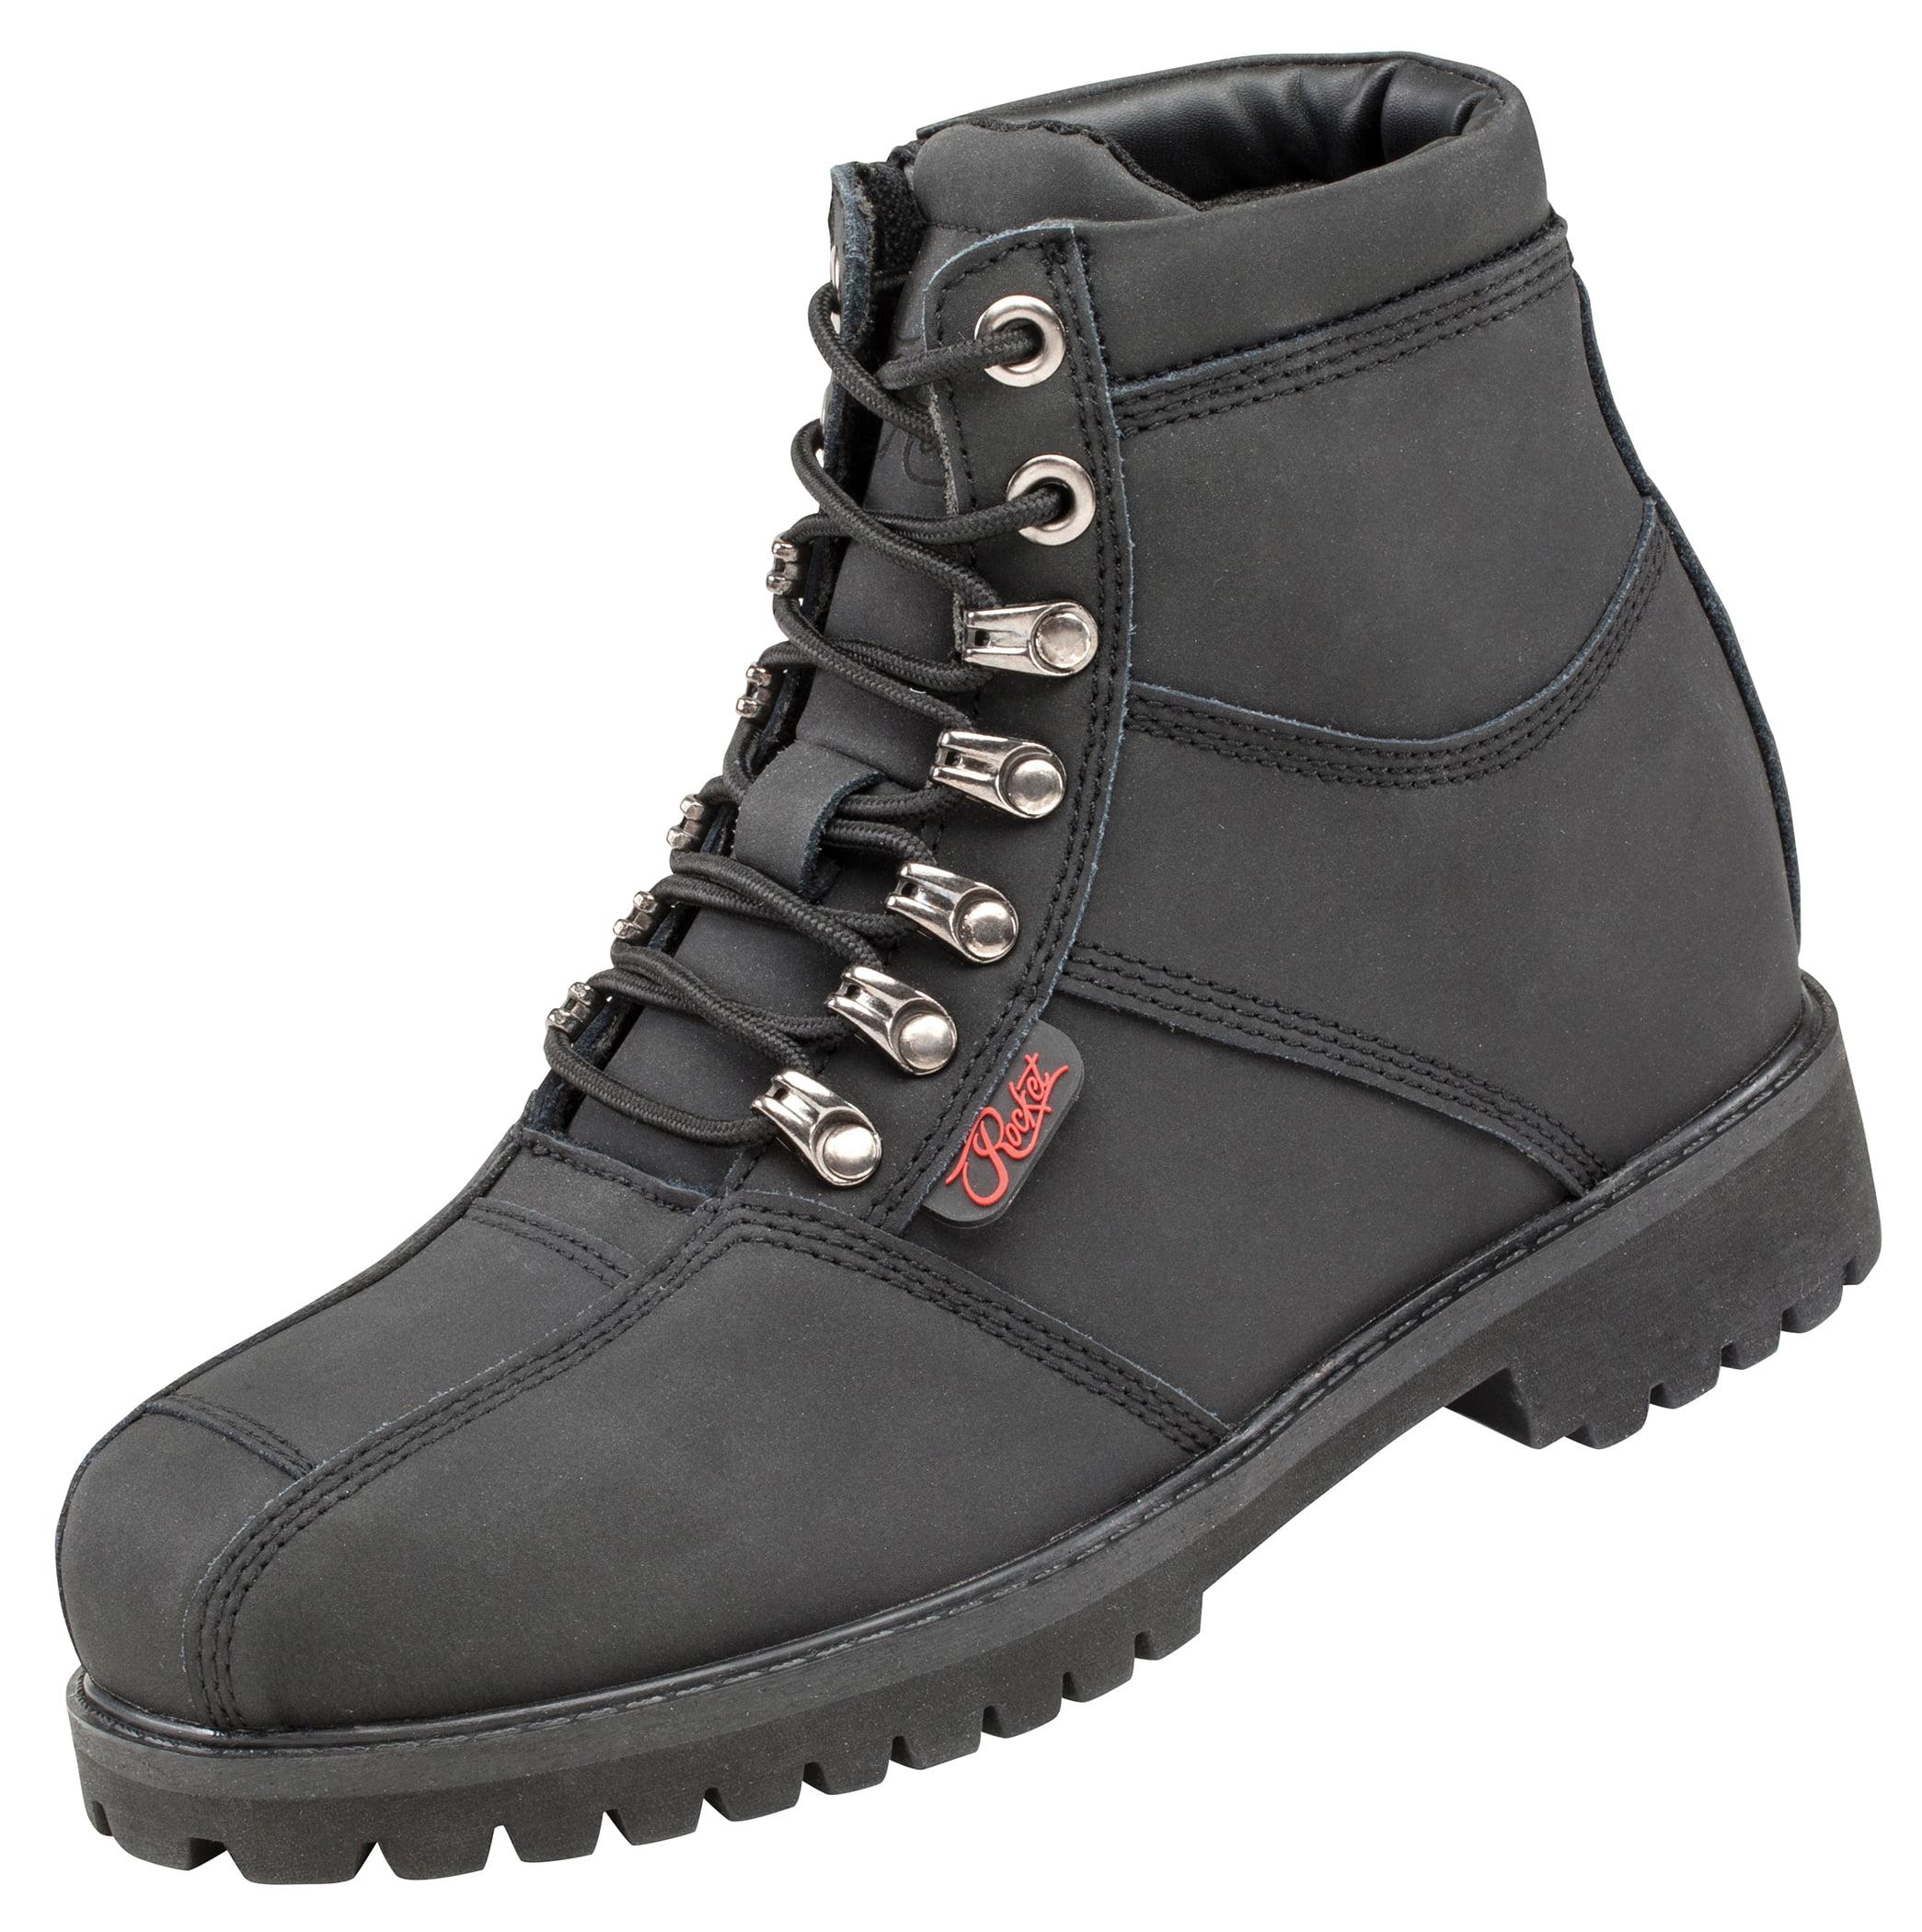 Joe Rocket Rebellion Womens Black Leather Boots